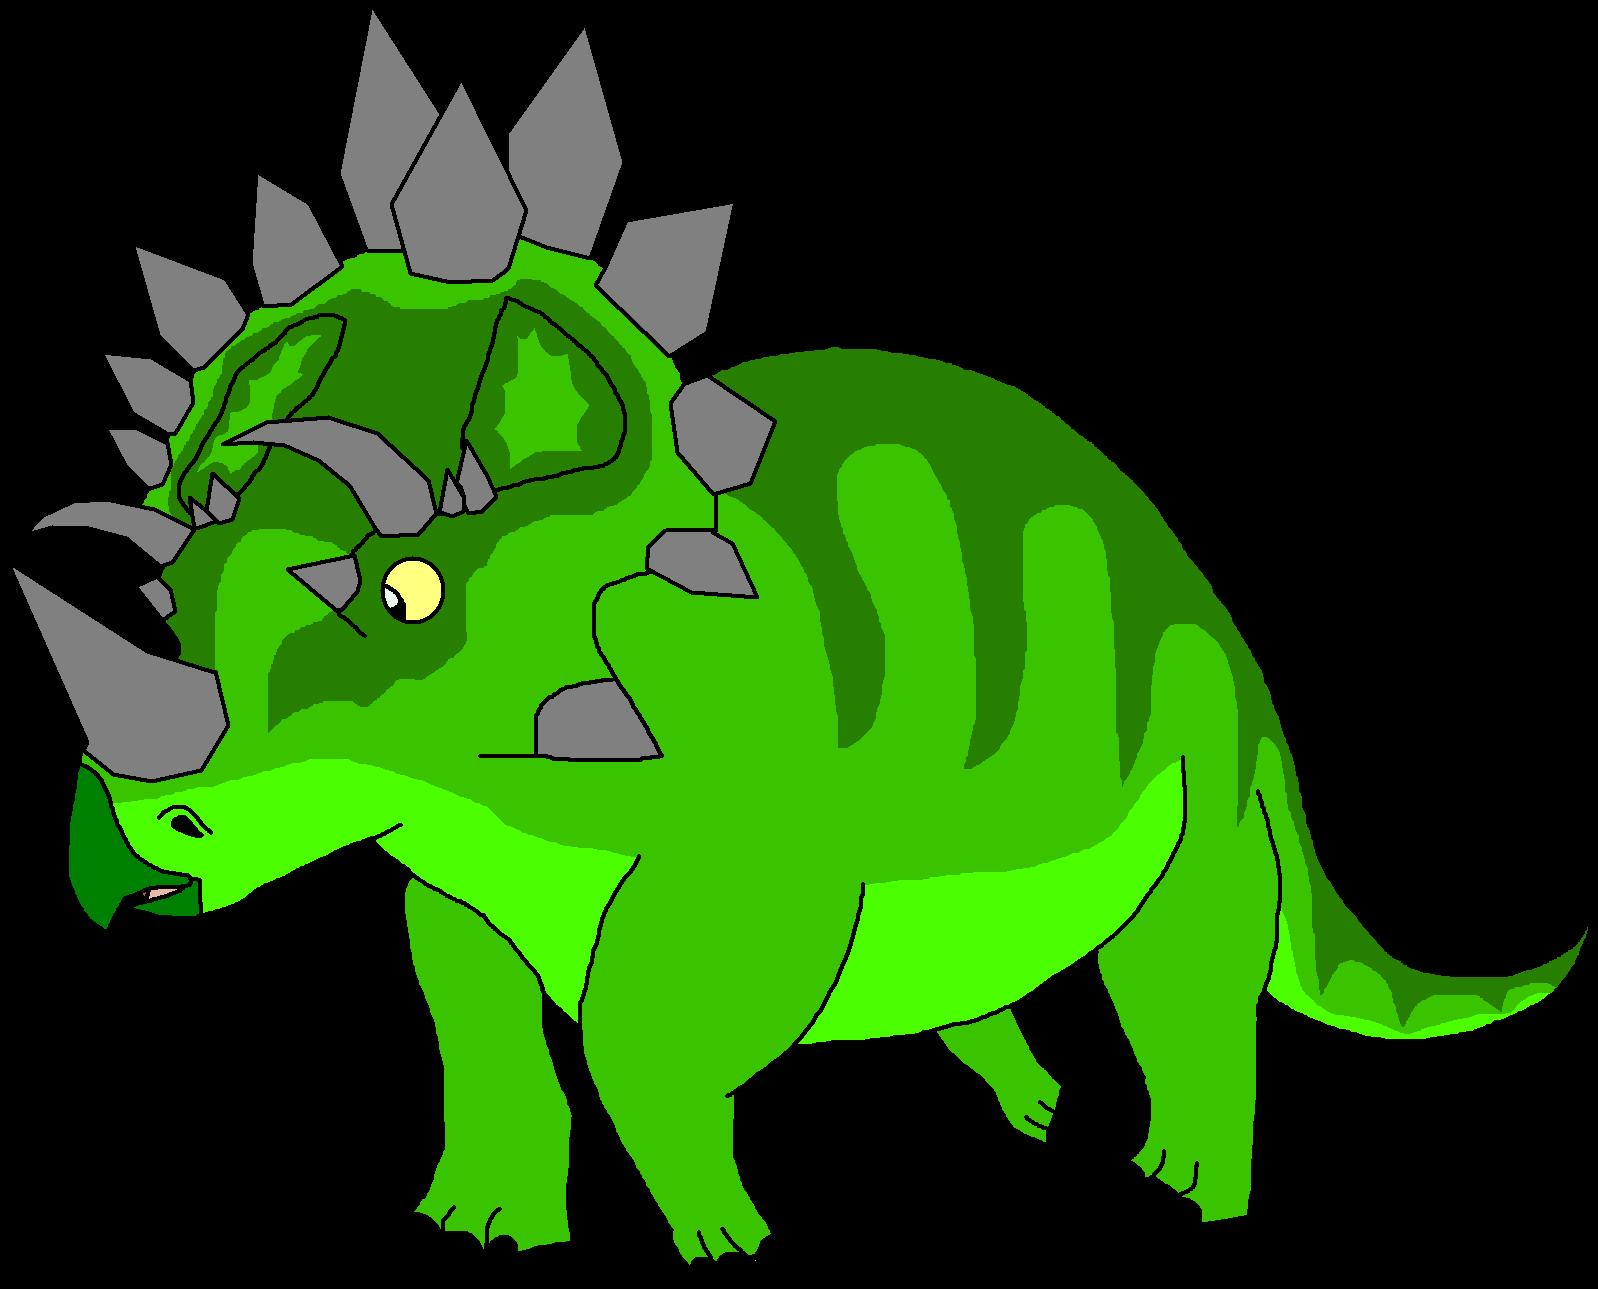 Planting clipart dinosaur. Image regaliceratops png pedia